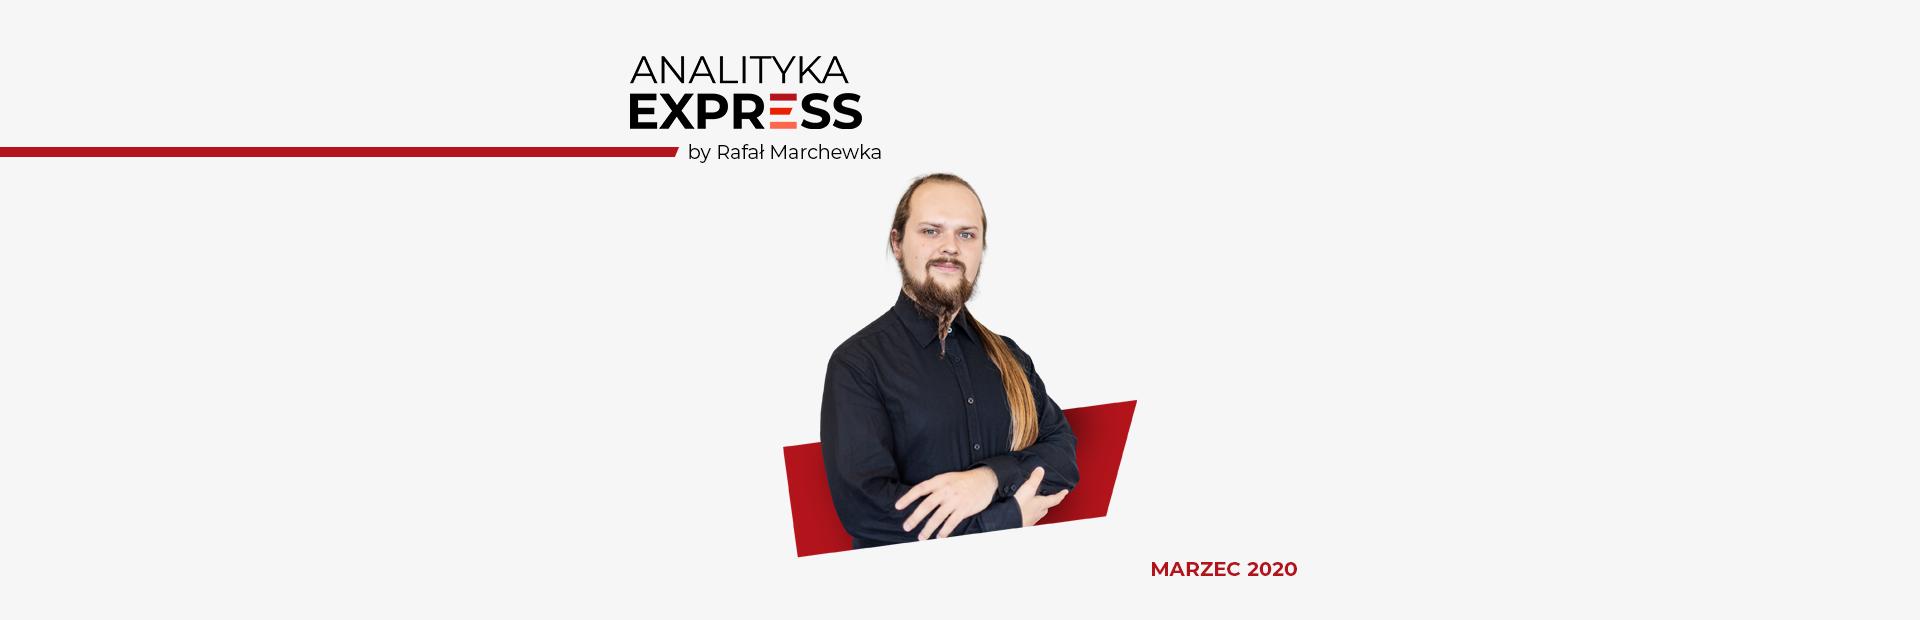 Analityka Express 03/2020